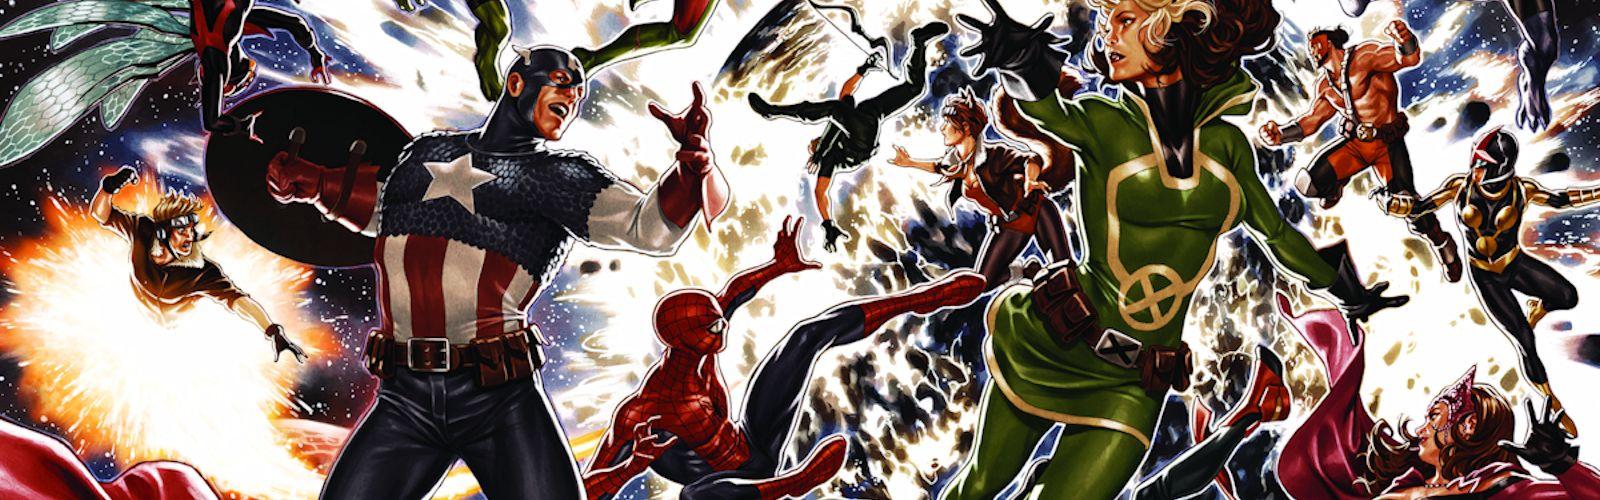 Avengers - No Surrender